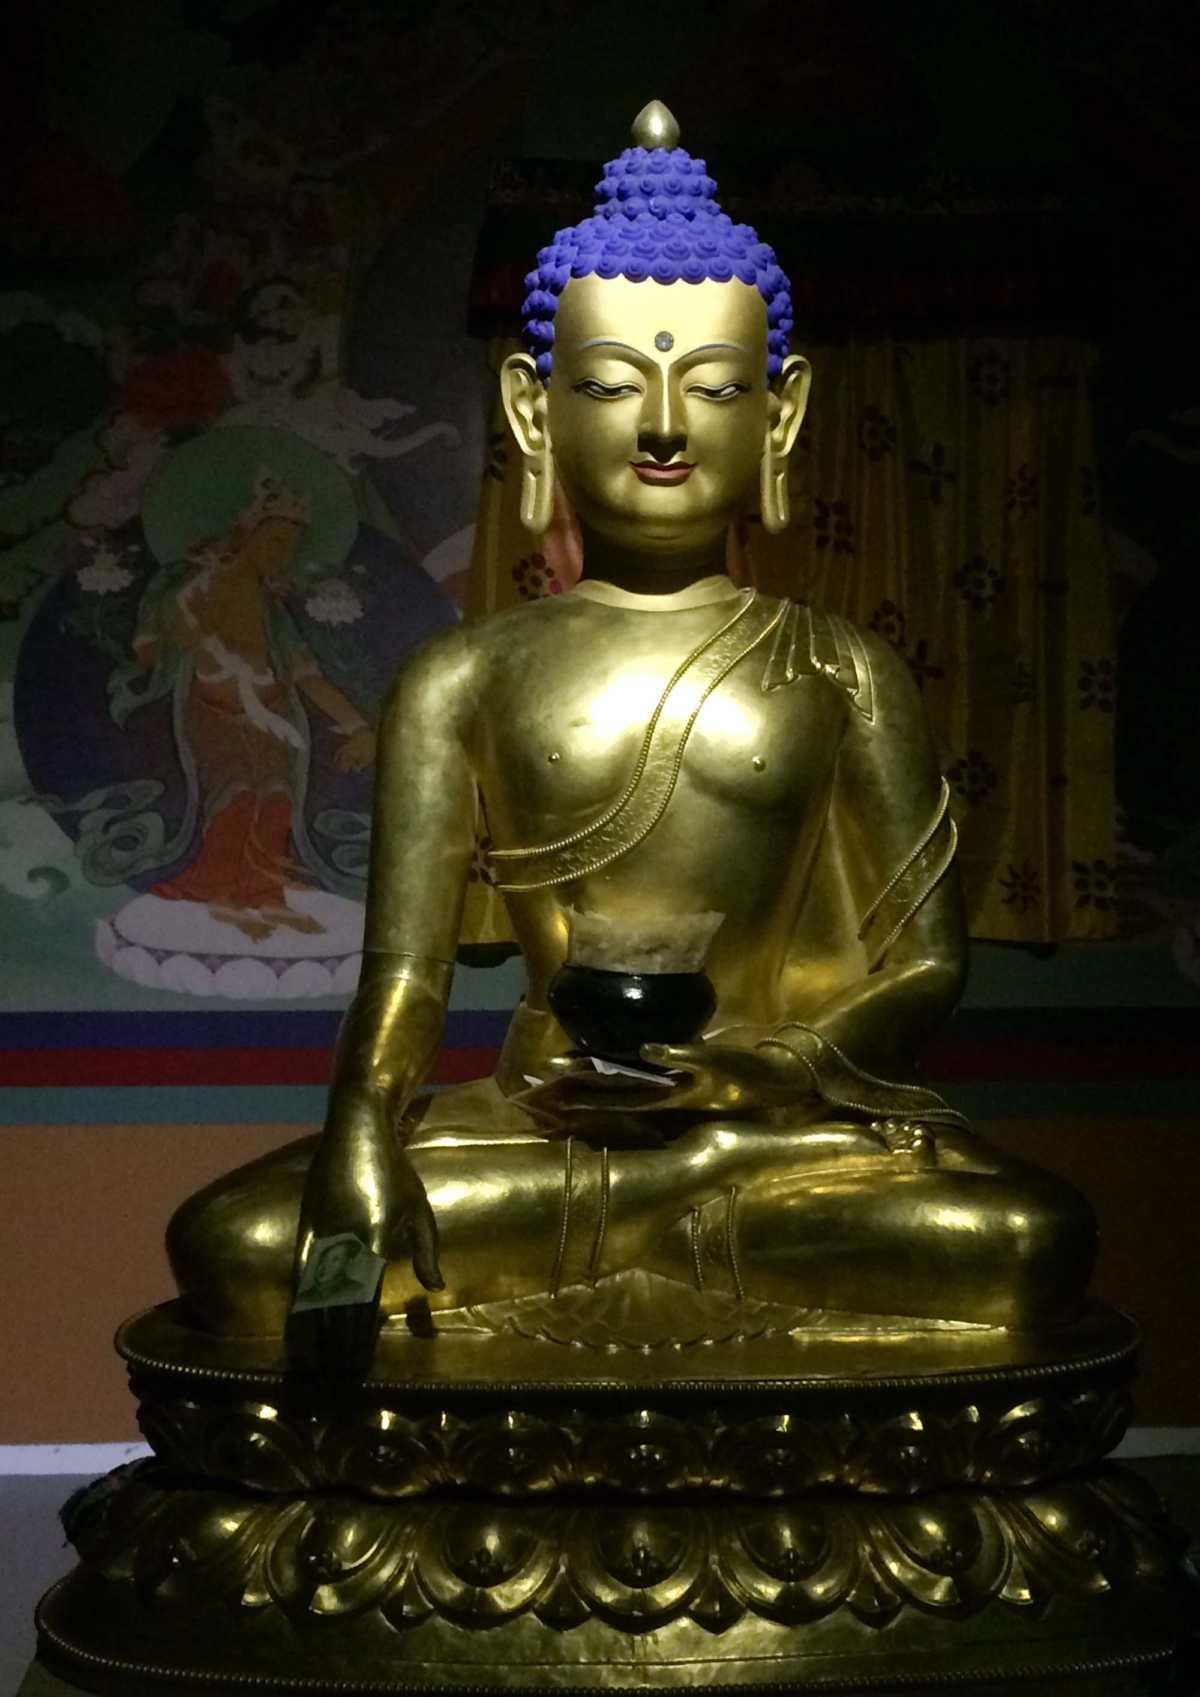 Buddha on display in Tibet Museum, Lhasa